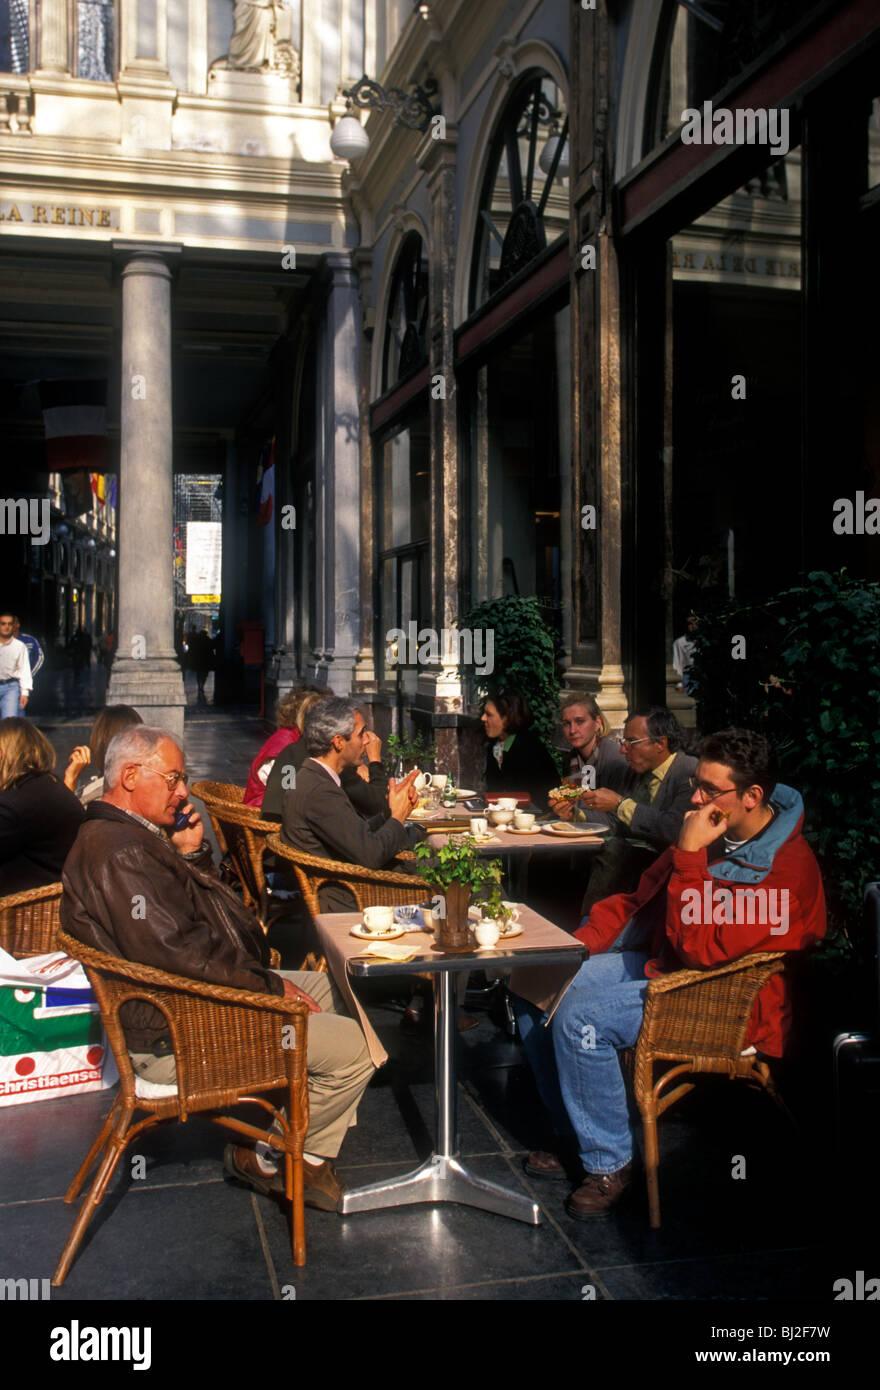 Belgians, Belgian men, teahouse, cafe, restaurant, Saint Hubert Royal Galleries, city of Brussels, Brussels, Brussels - Stock Image